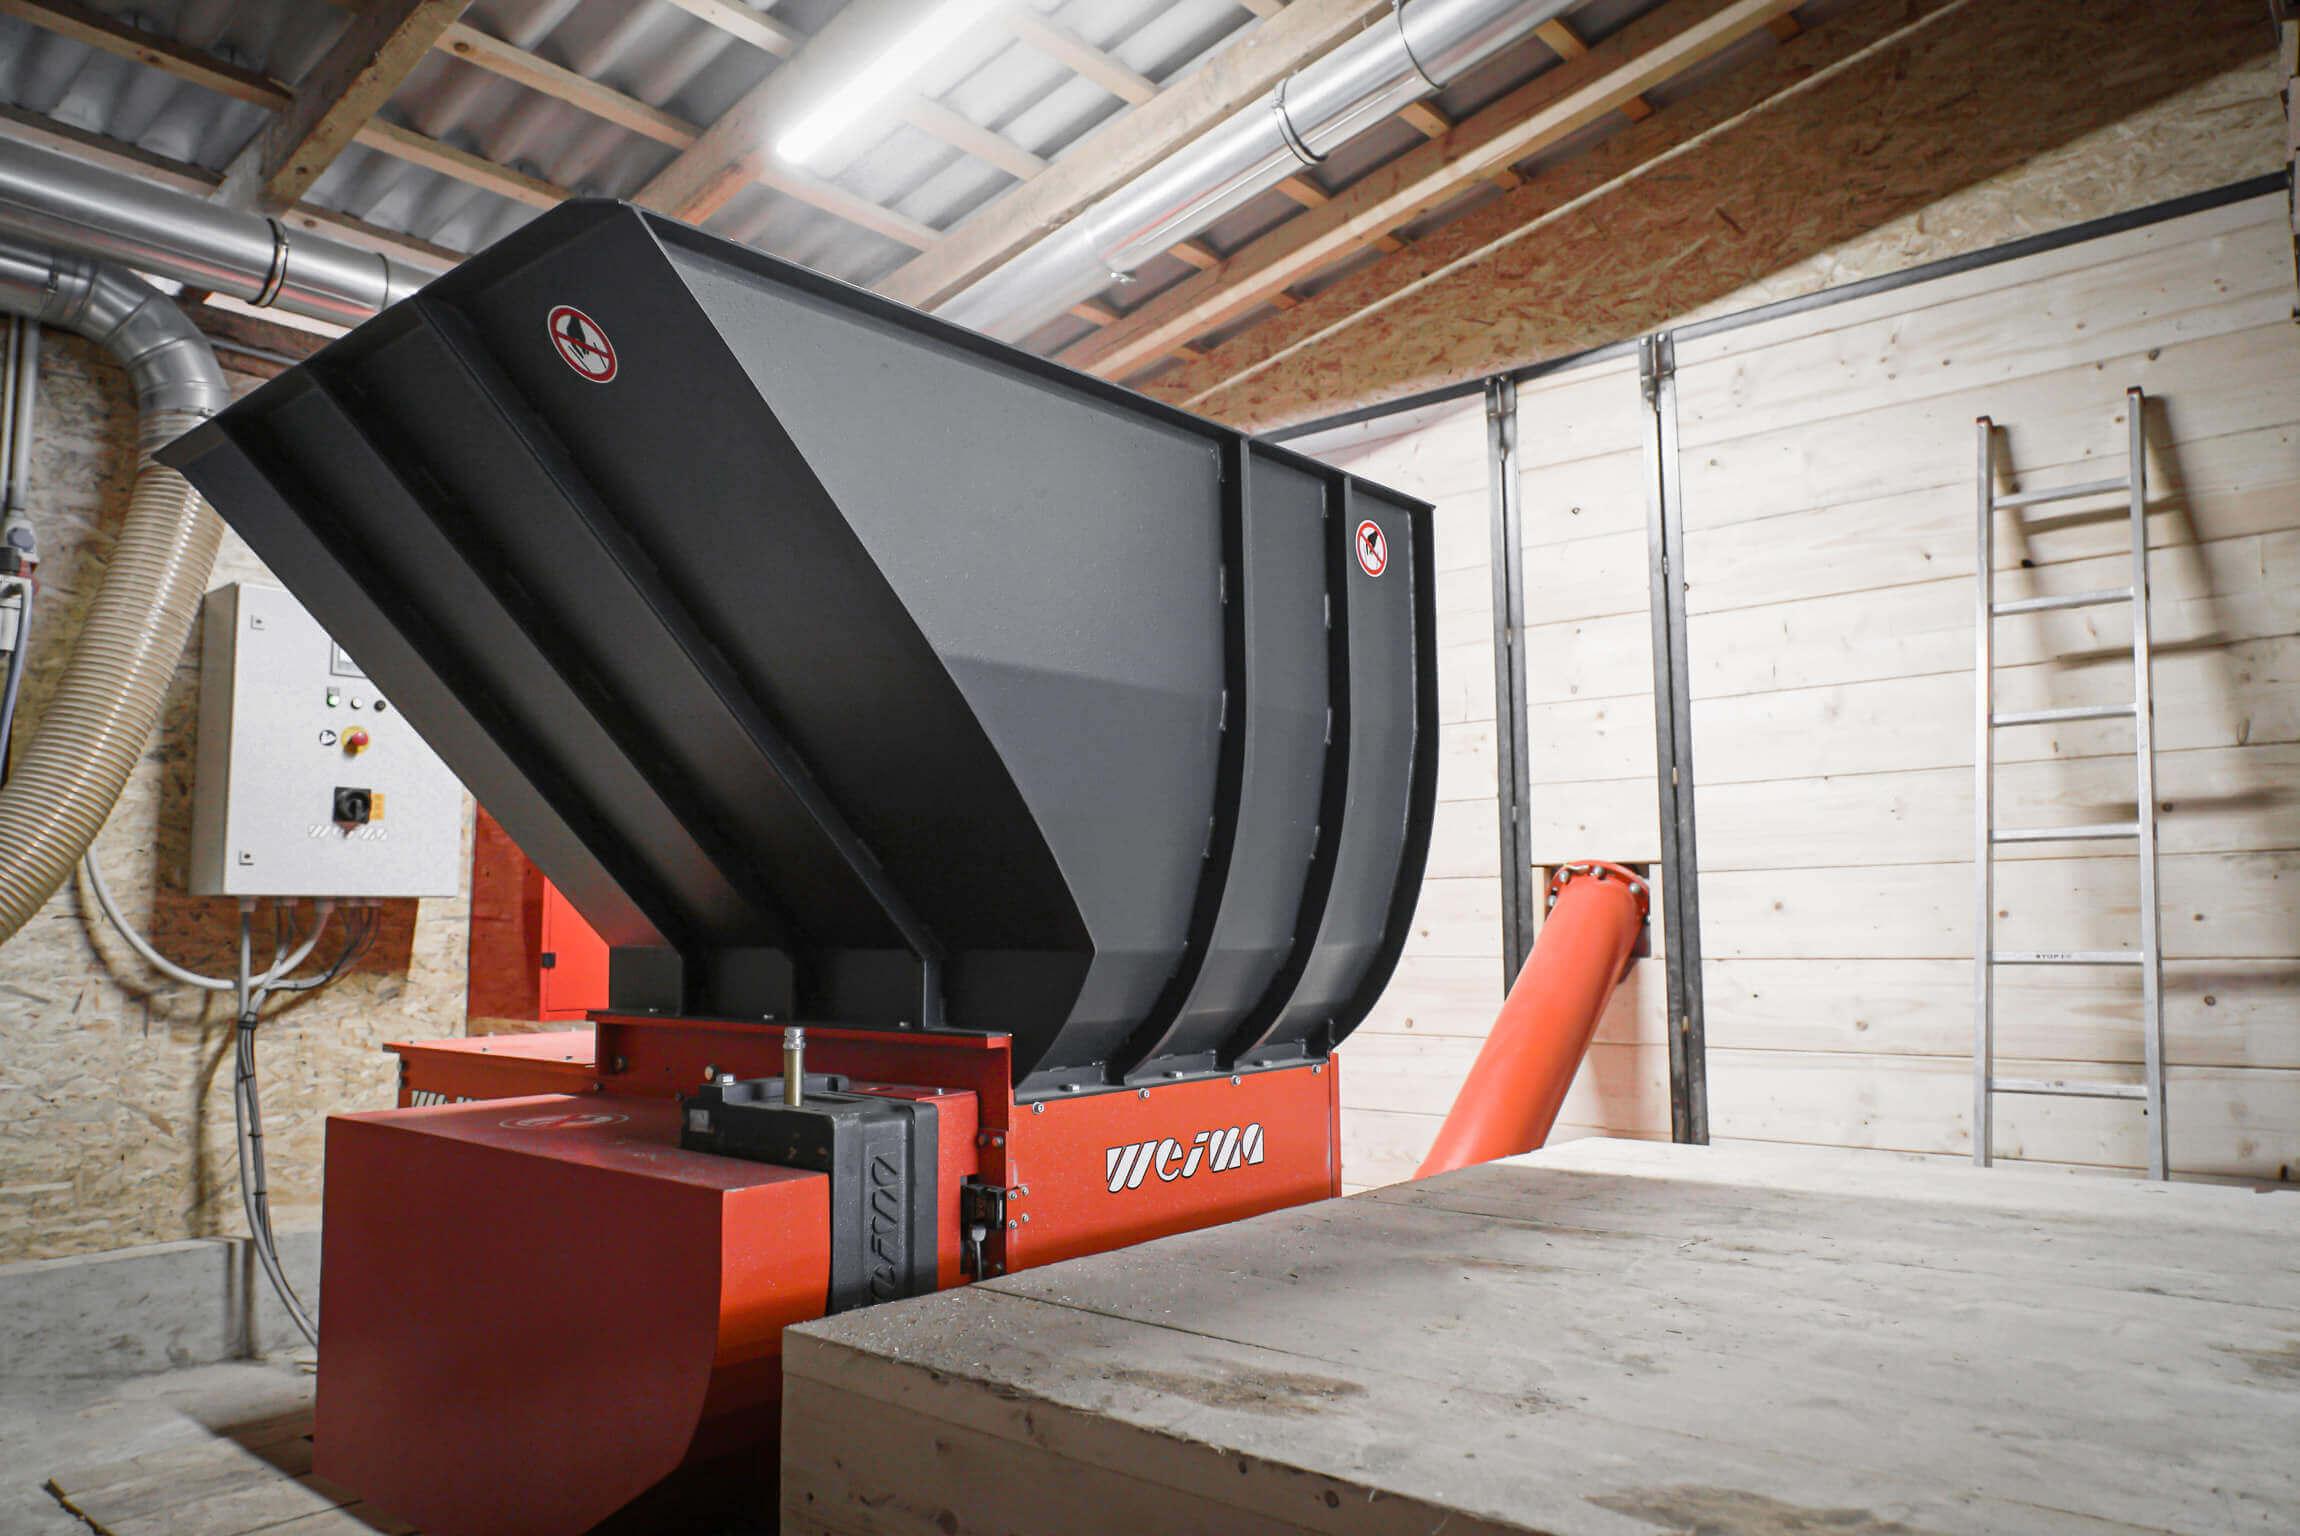 WEIMA WL 6 shredder shreds wood waste for heating